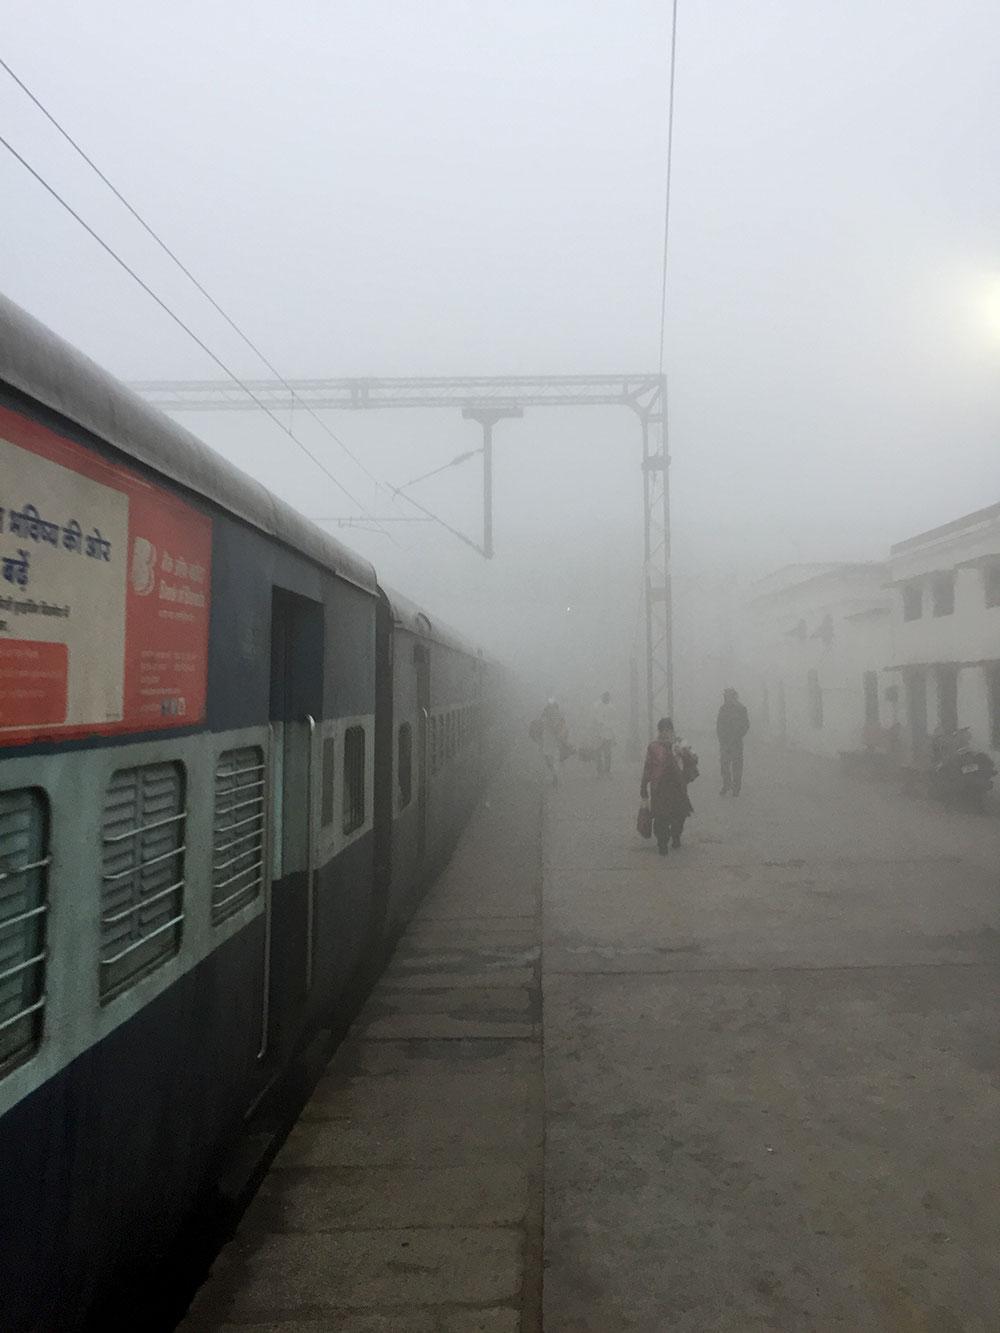 Arriving in Amritsar - Photo by Abhishek Sarma   Happymind Travels